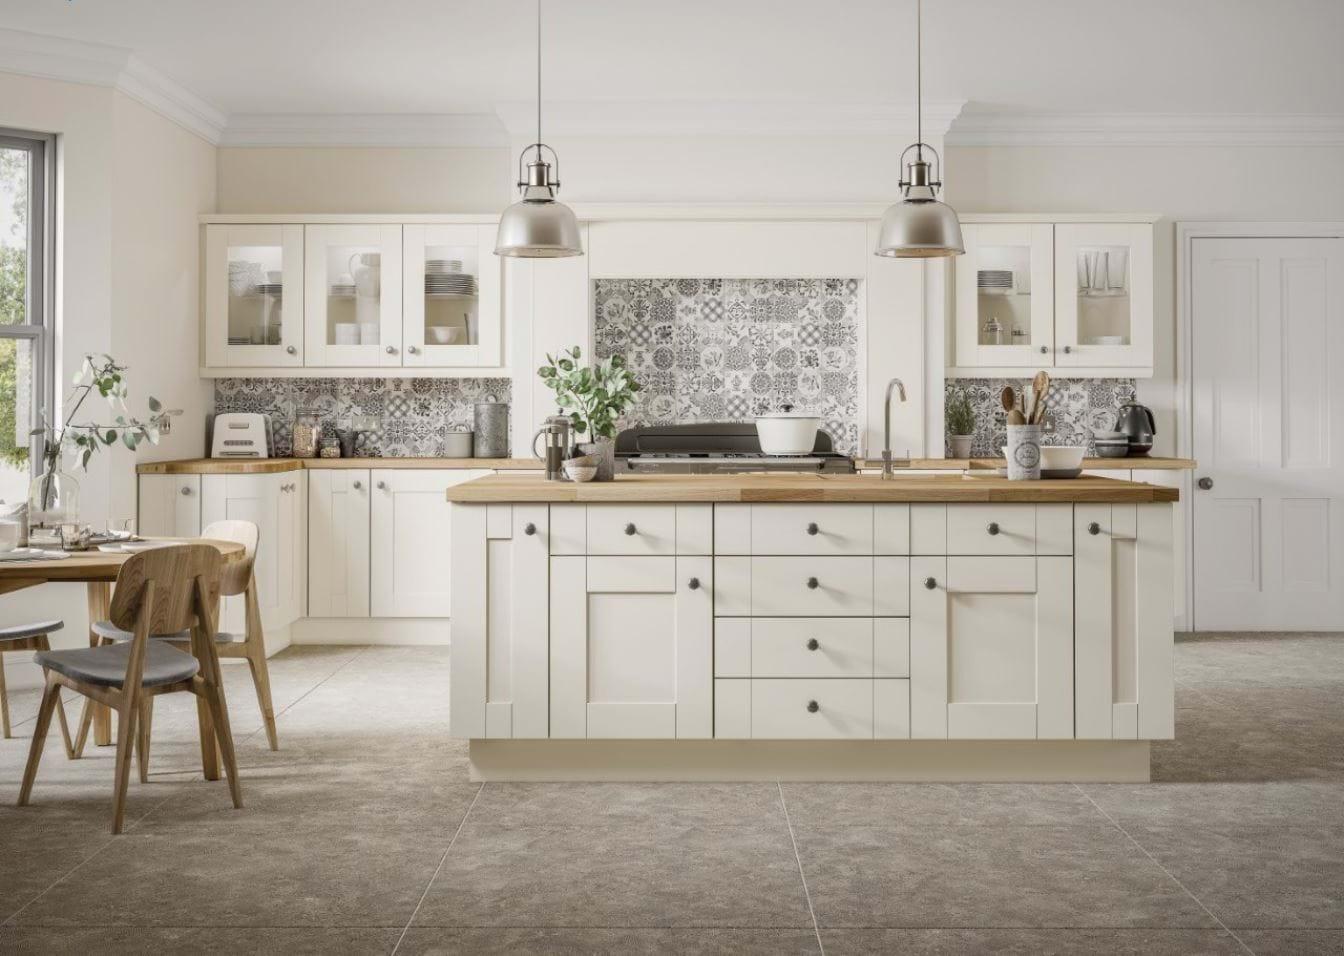 New Kitchen Studio Launch at Leekes Bilston